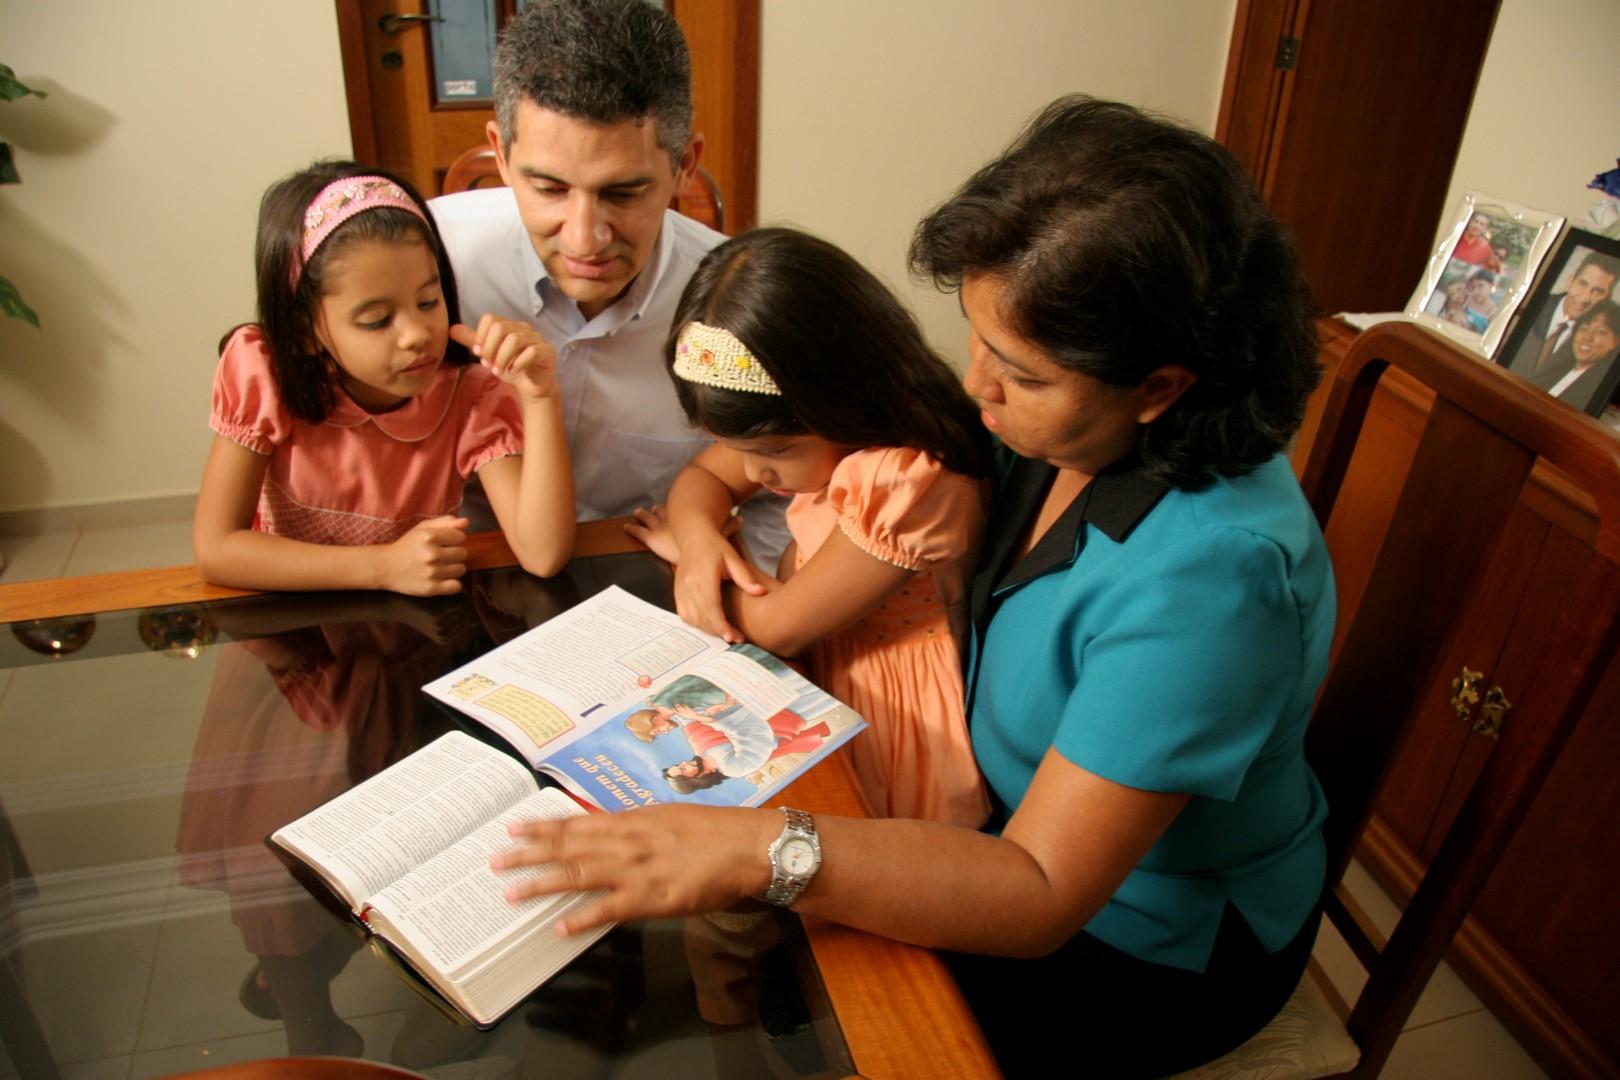 FamilyStudy (copyright Neuber Oliveira churchphoto.de) - ID 18163 (Large)